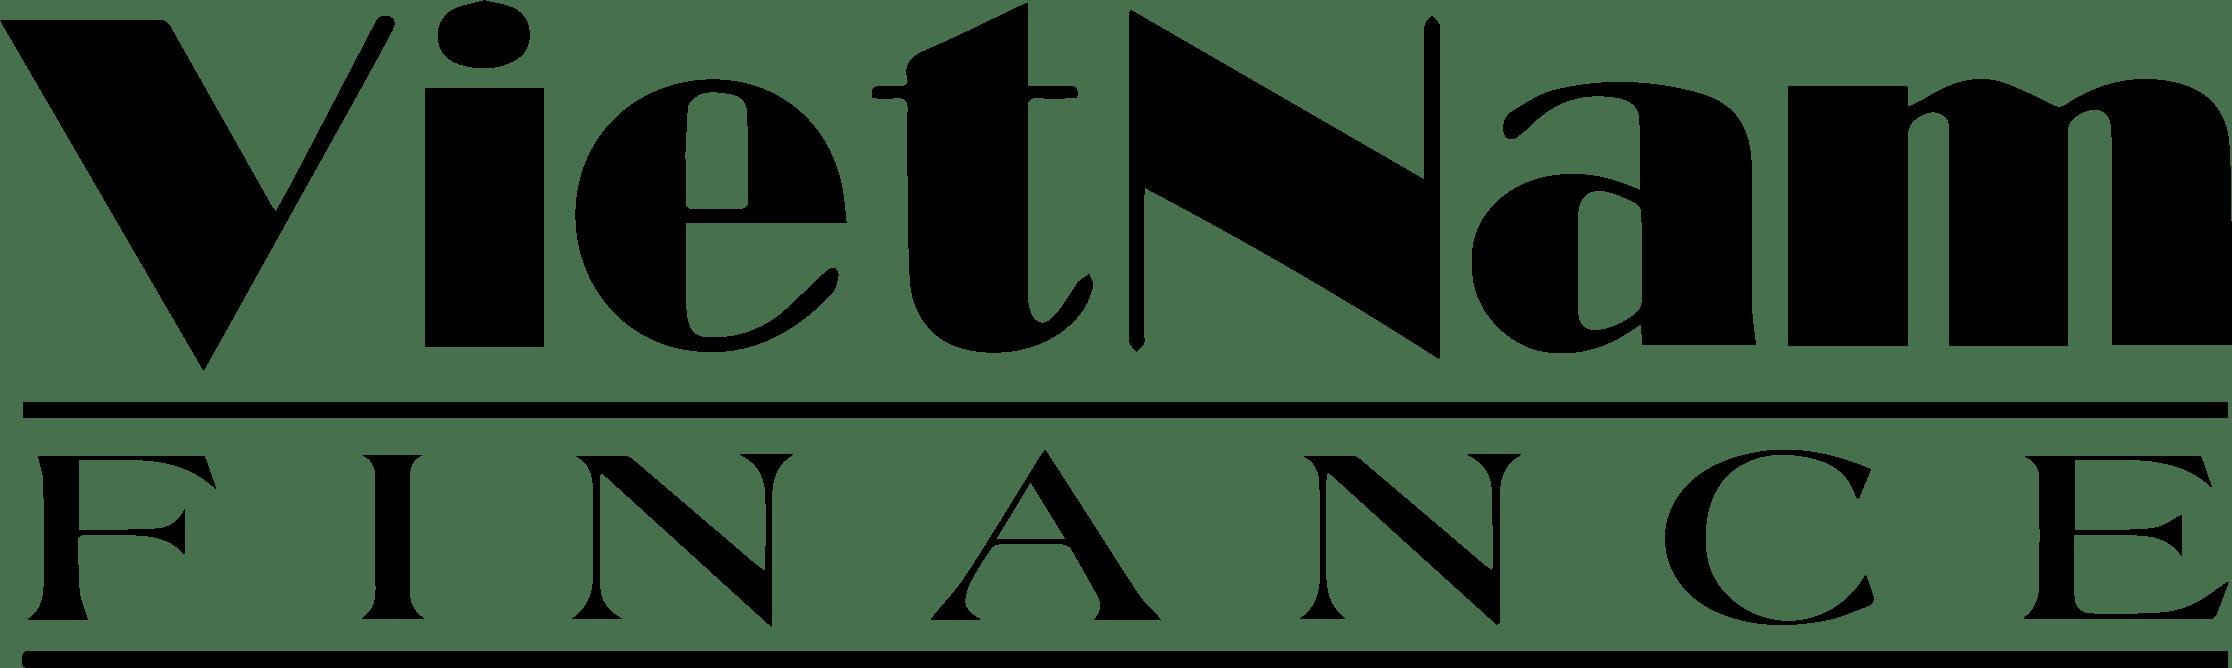 vn-finance